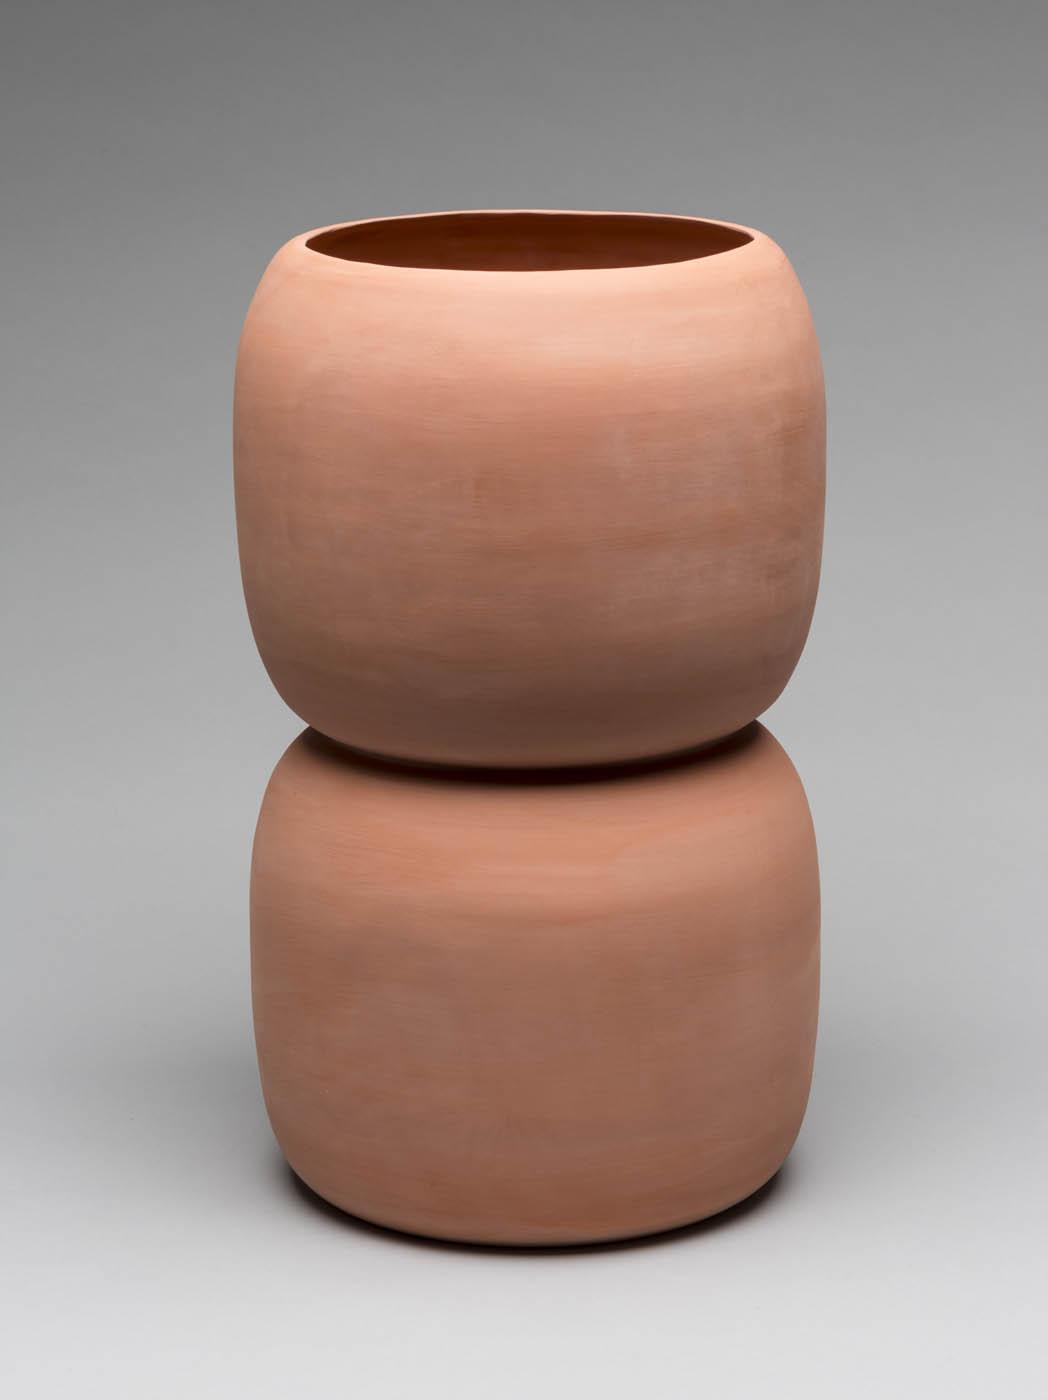 Evan D. Fay - Terracotta Side Table